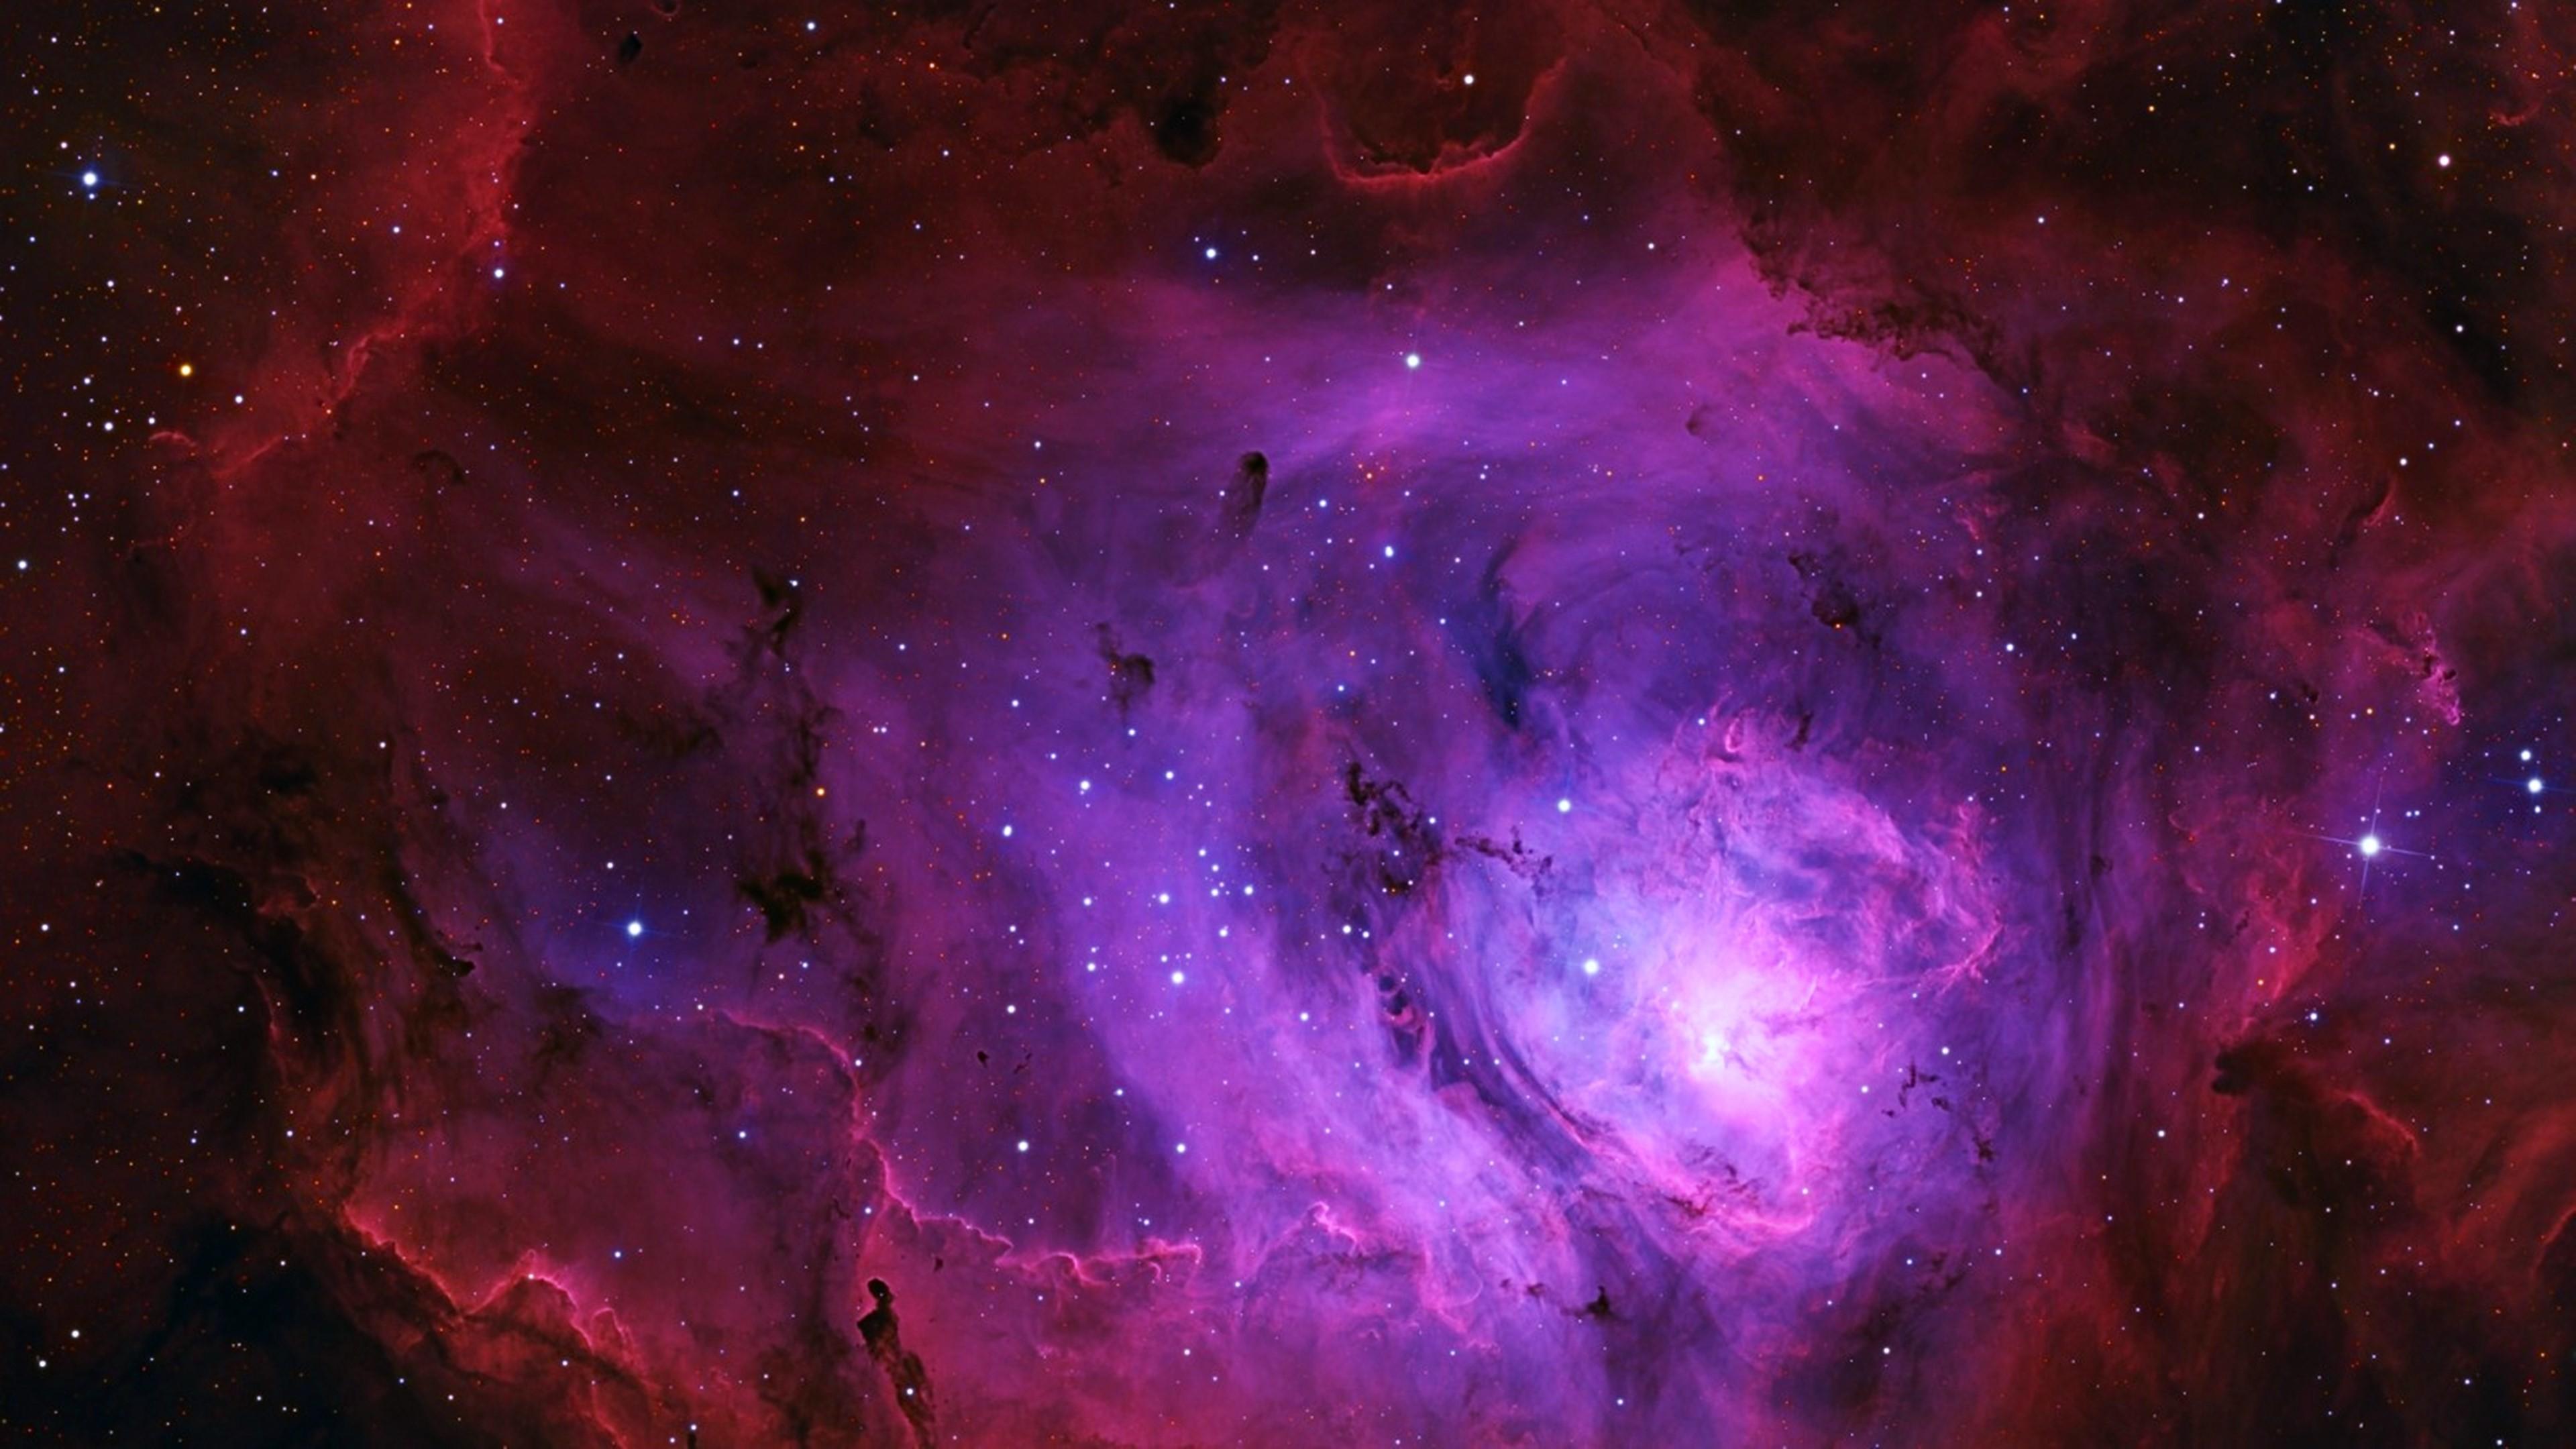 4k wallpaper nebula (3840×2160)